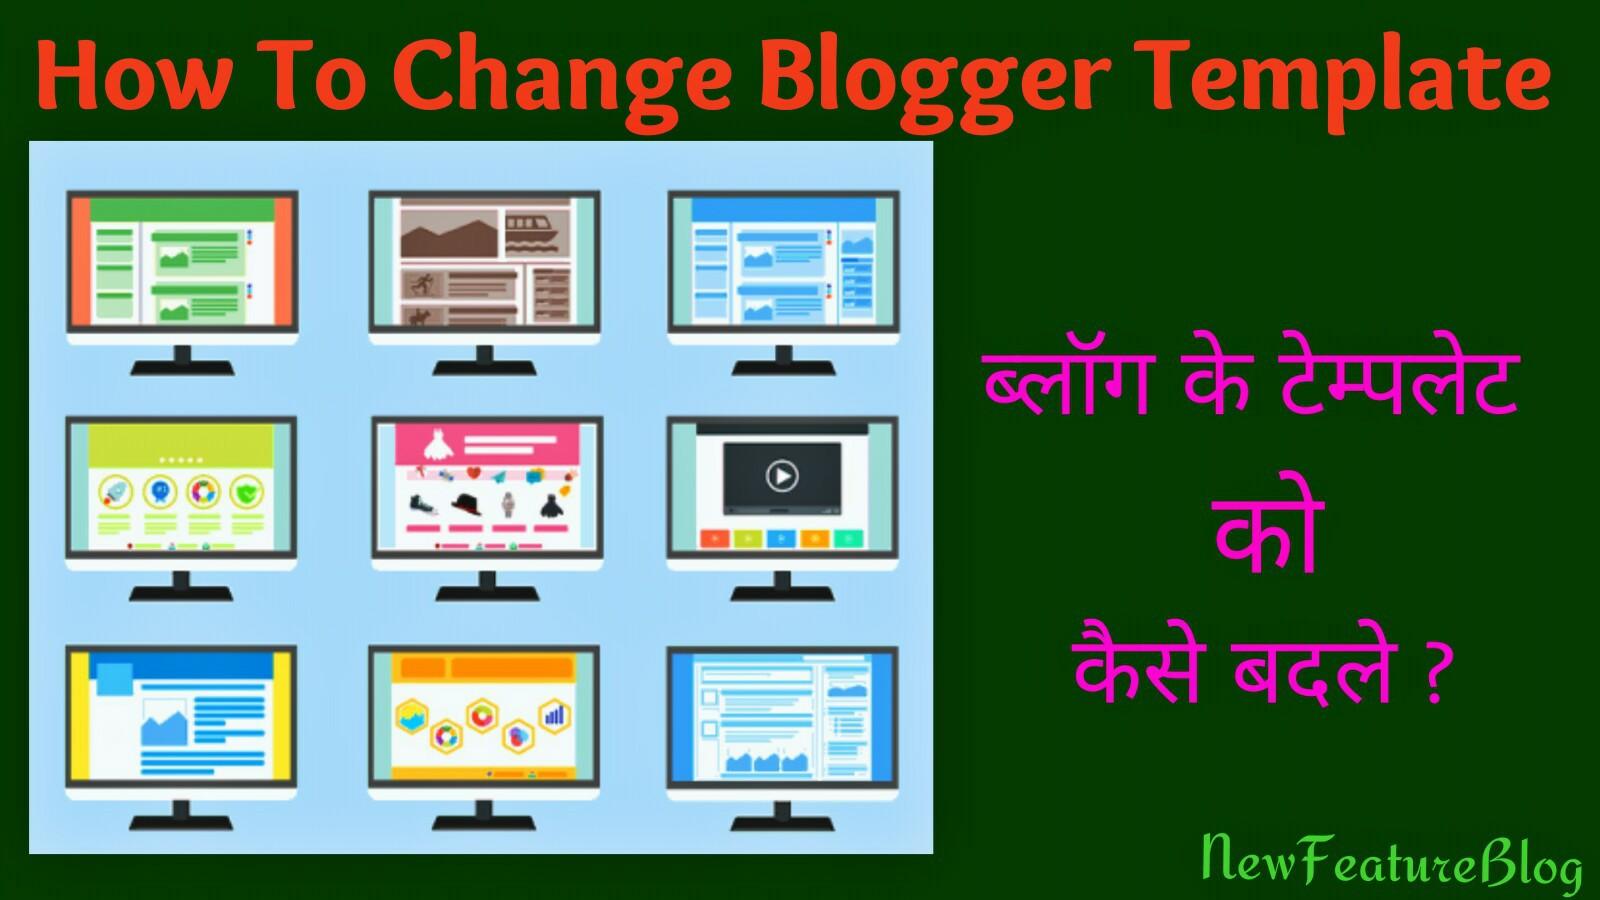 Blog Ke Template Ko Change Ya Upload Kaise Kare New Feature Blog